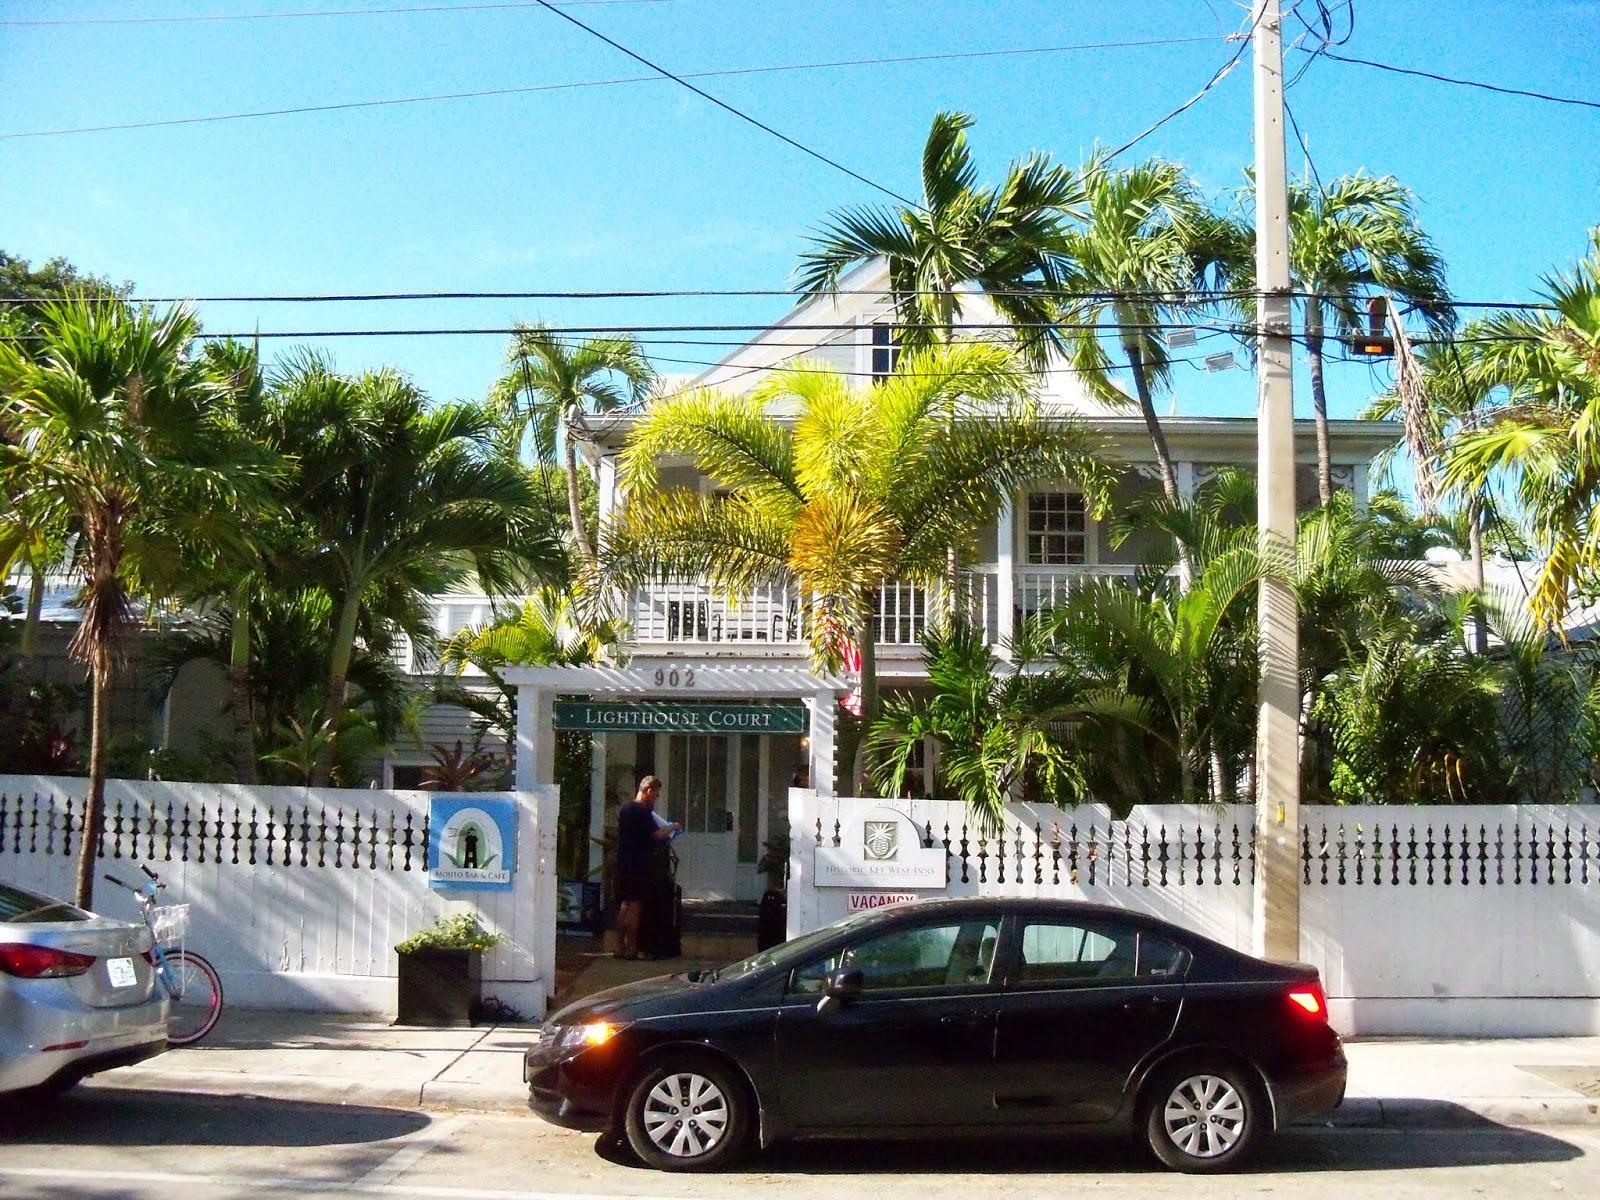 Key West Vacation - 116_5404.JPG